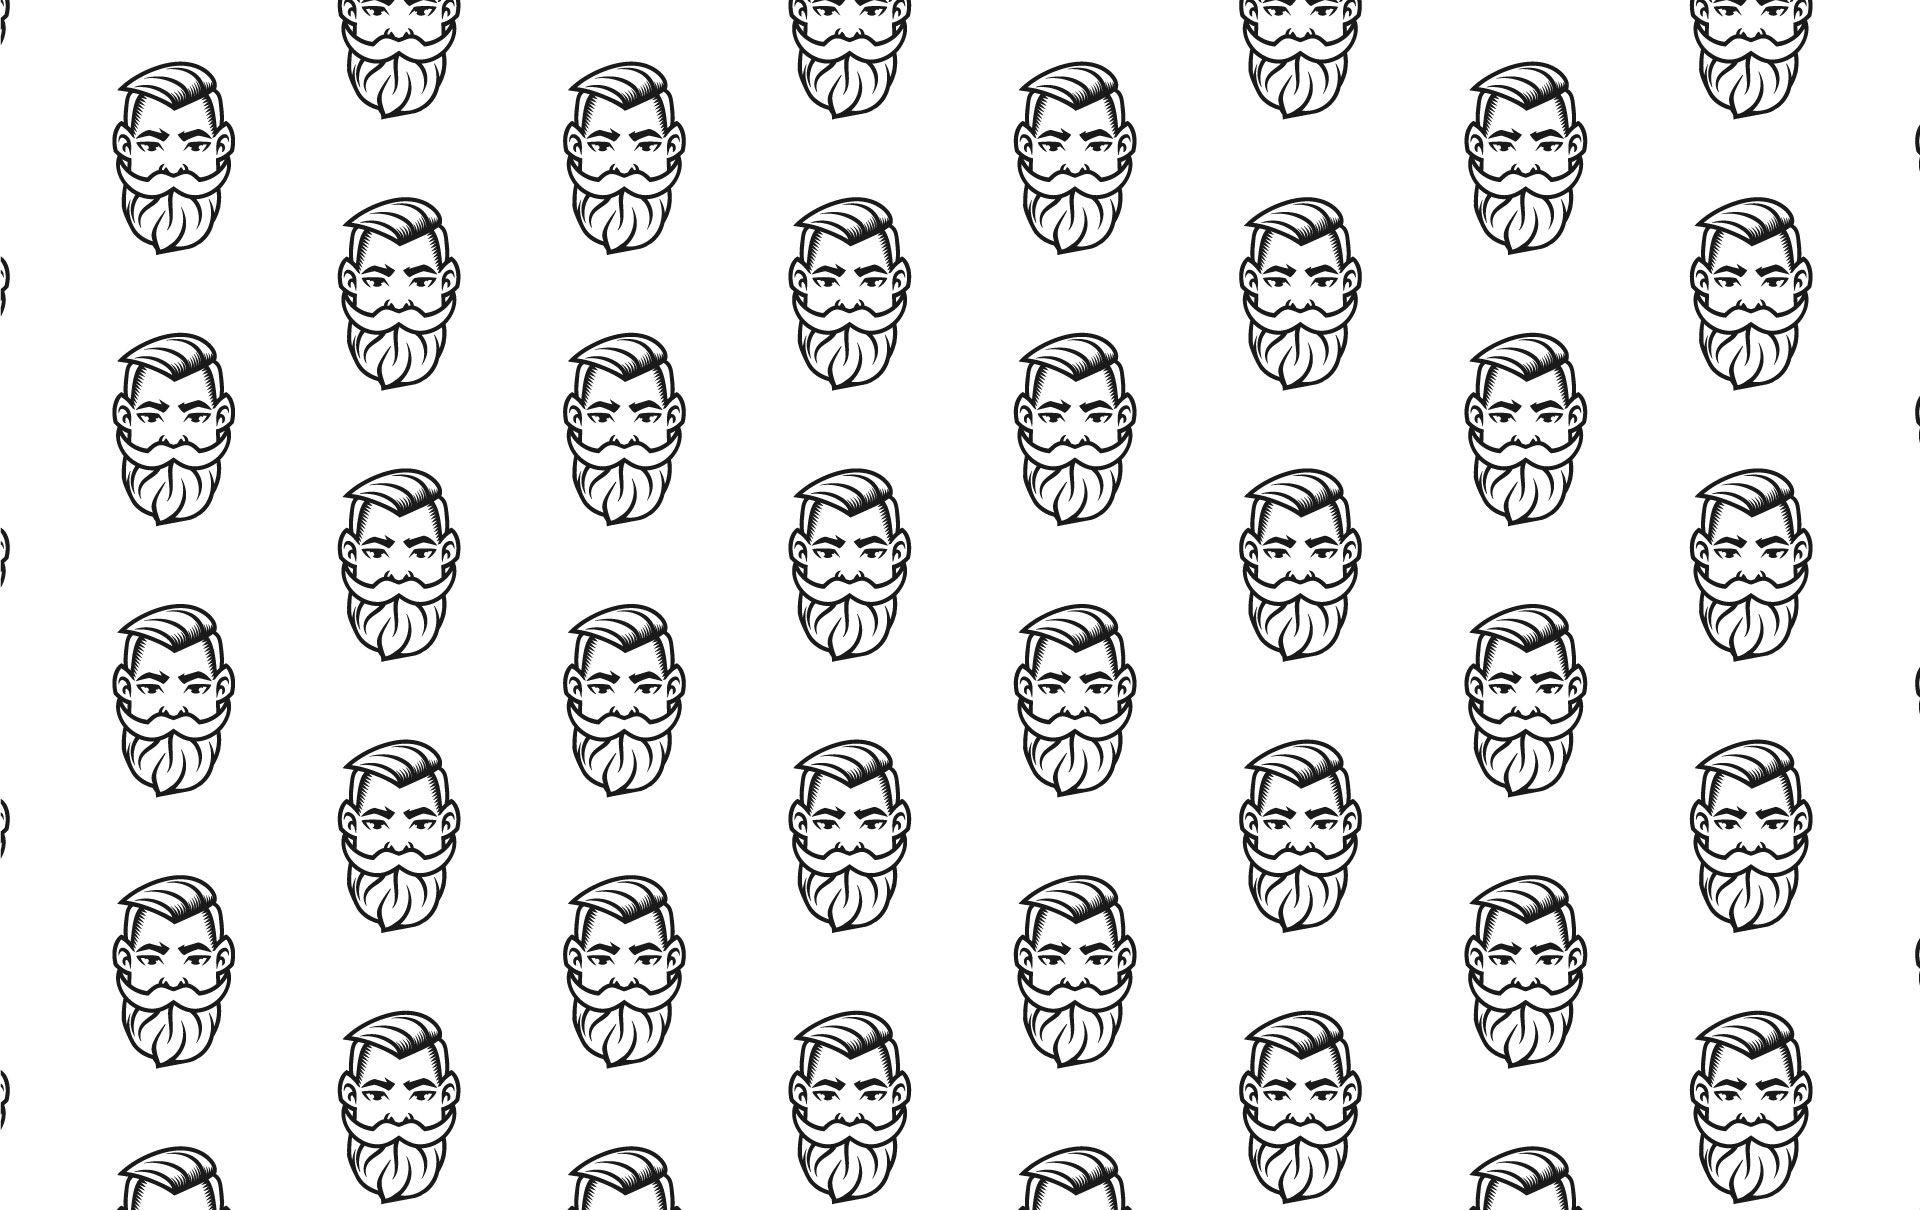 Brzytwa - barber shop pattern 1